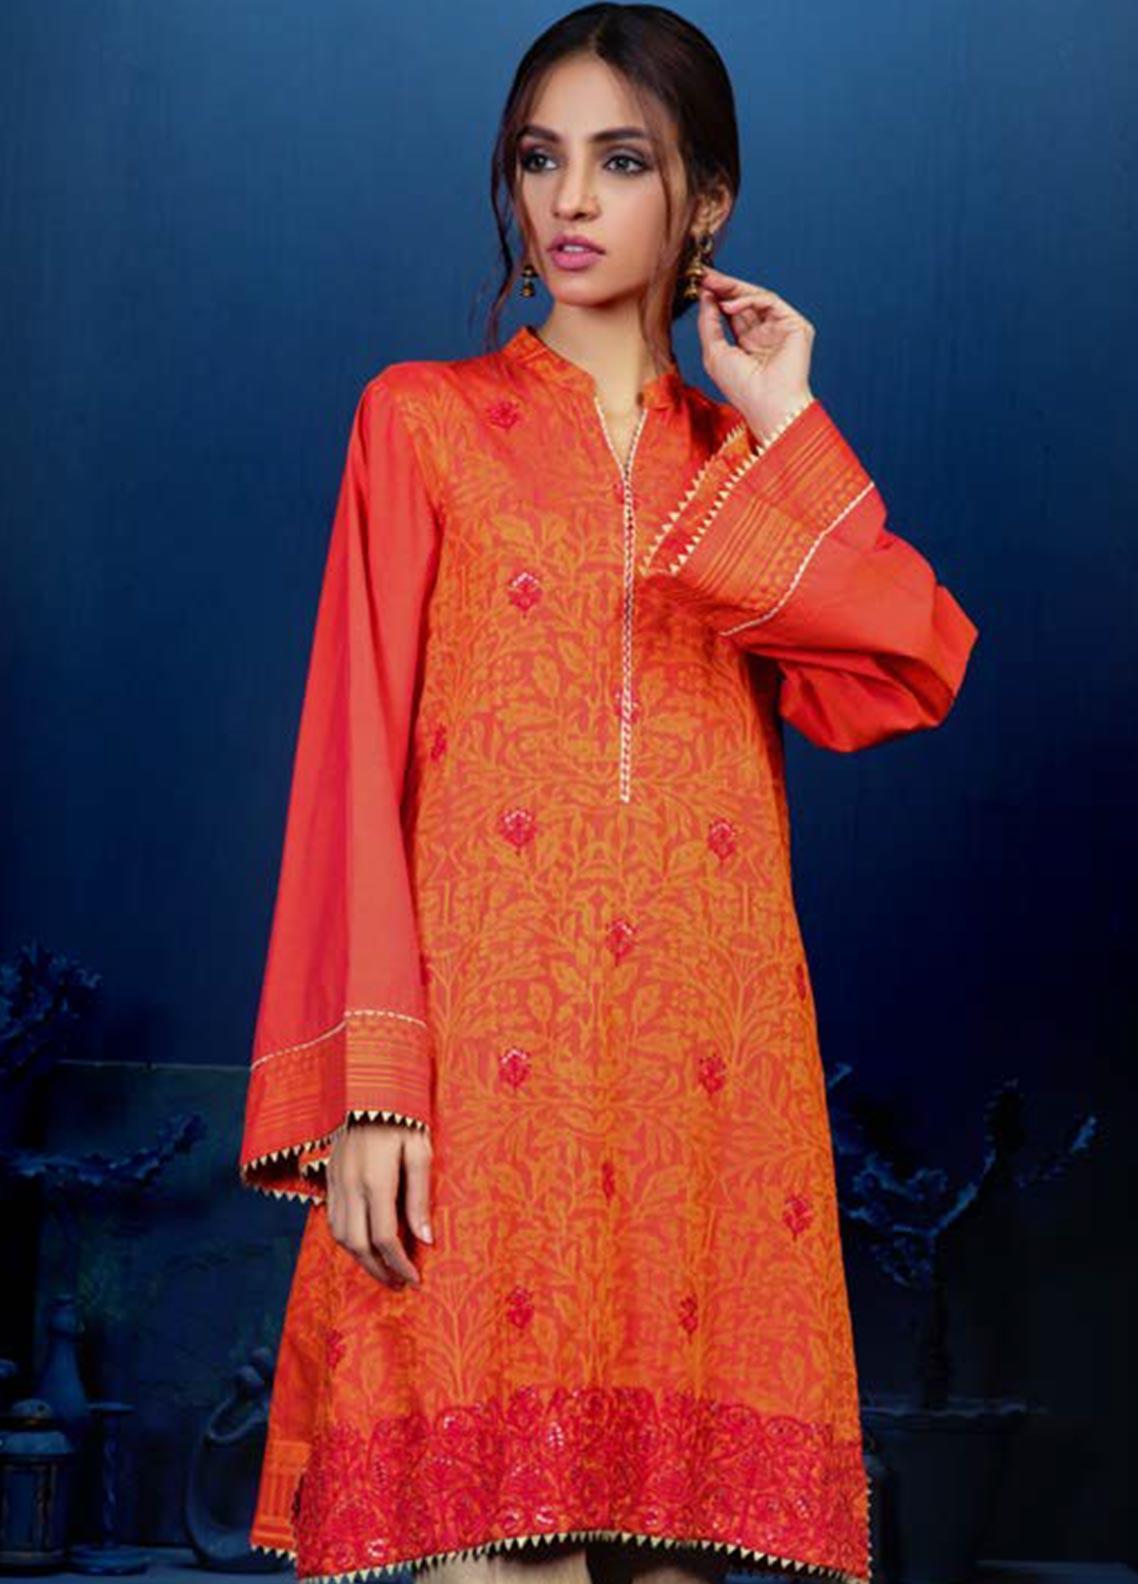 Orient Textile Embroidered Linen Unstitched Kurties OT19W 234 MOLTEN LAVA B - Winter Collection